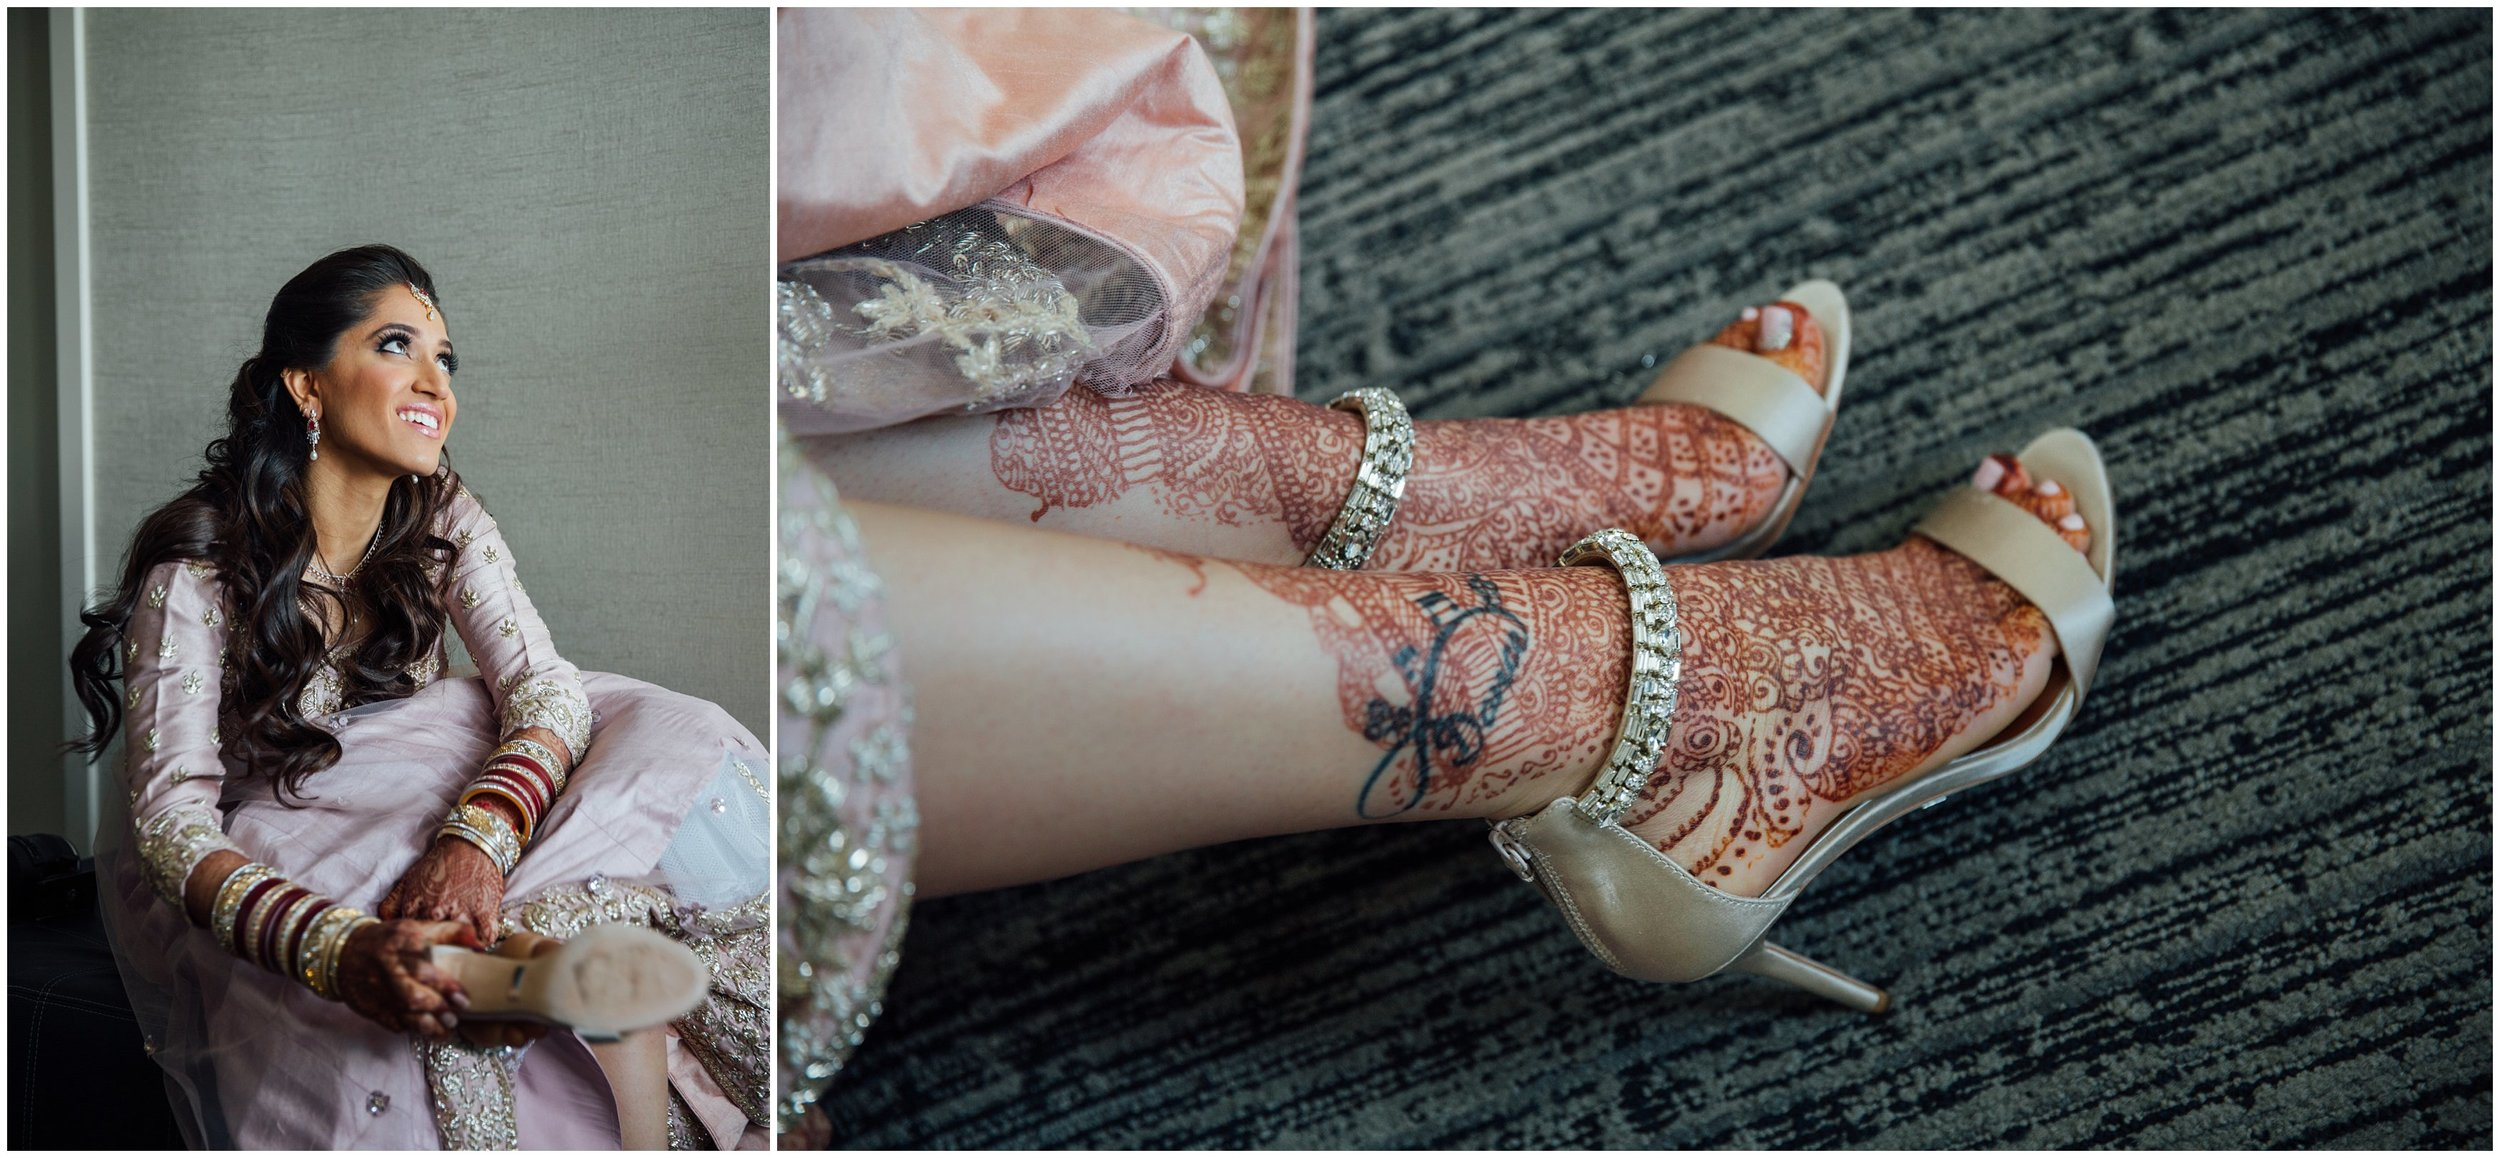 Le Cape Weddings - South Asian Wedding in Illinois - Tanvi and Anshul -1384_LuxuryDestinationPhotographer.jpg